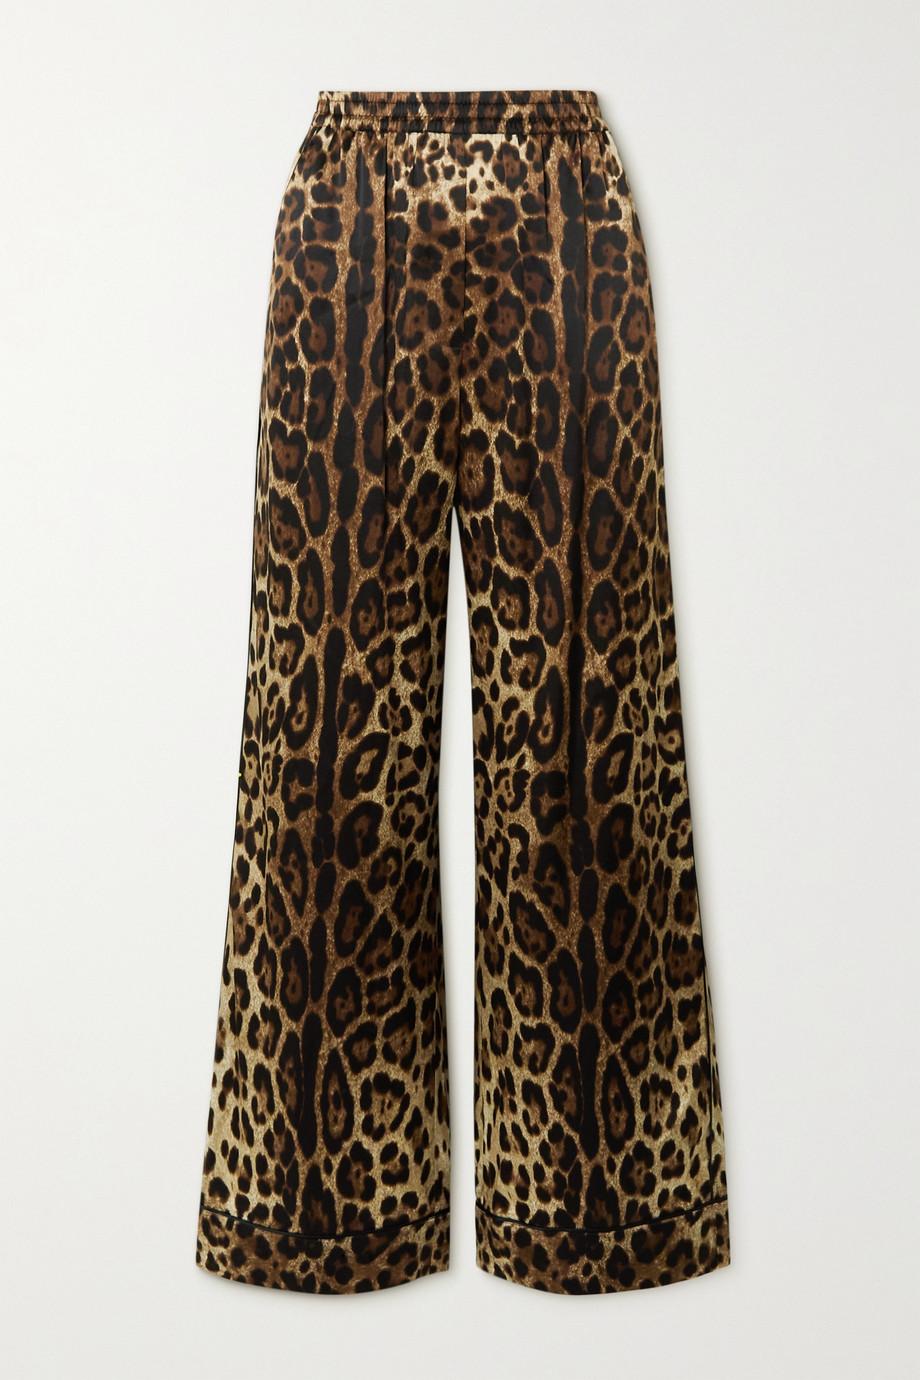 Dolce & Gabbana Pantalon de pyjama en satin de soie mélangée à imprimé léopard Diva